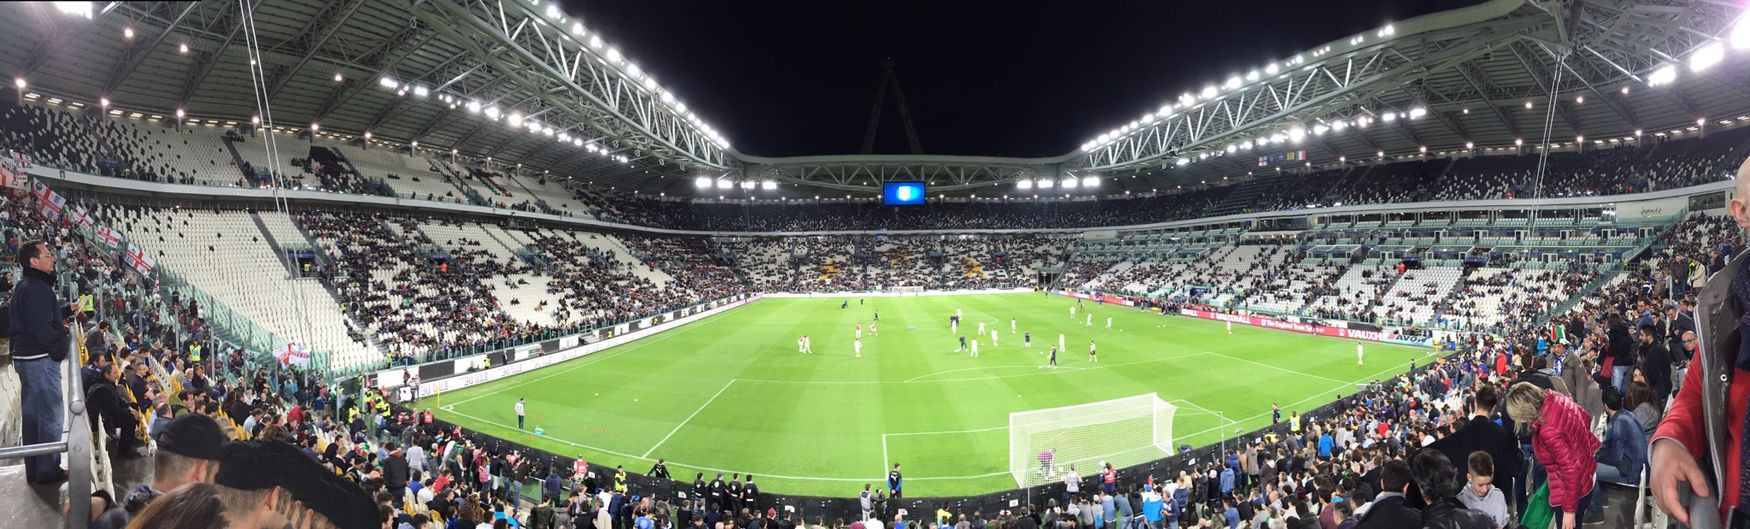 Italia 🇮🇹 Inghilterra 🇬🇧 • Turin Juventus Stadium Match Playing Better Together Taking Photos Photography Picoftheday EyeEm EyeEm Best Edits Eye4photography  EyeEm Best Shots